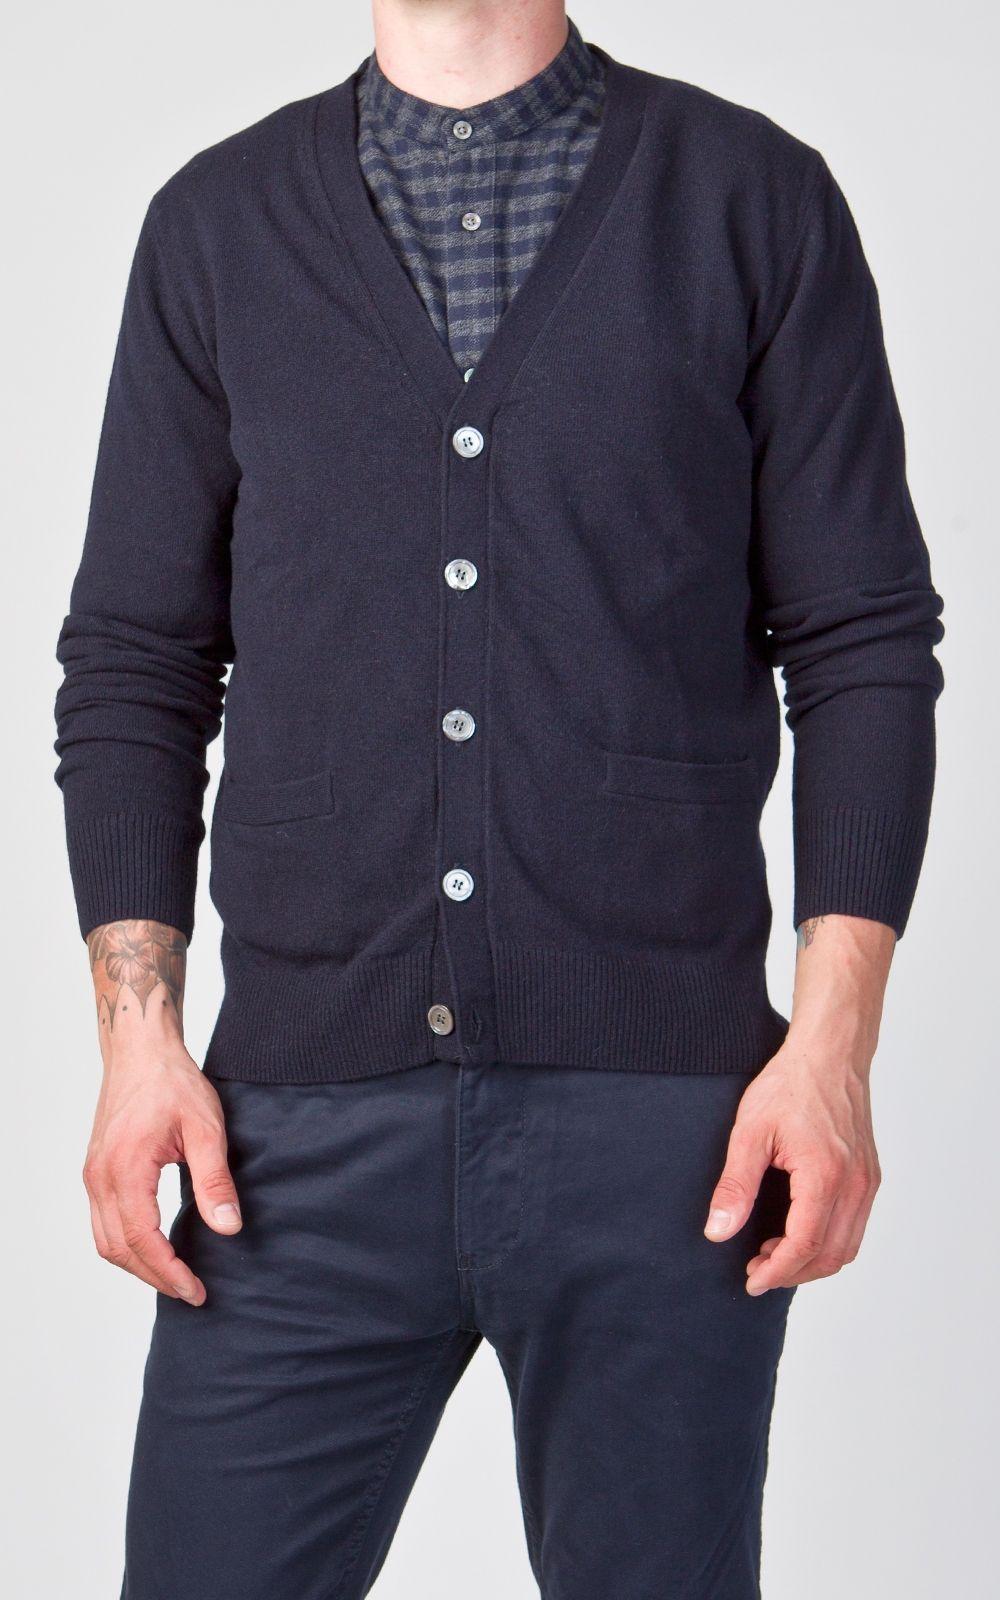 NN.07 Jonathan Fine Merino Wool Cardigan Navy Blue | Best Raw ...